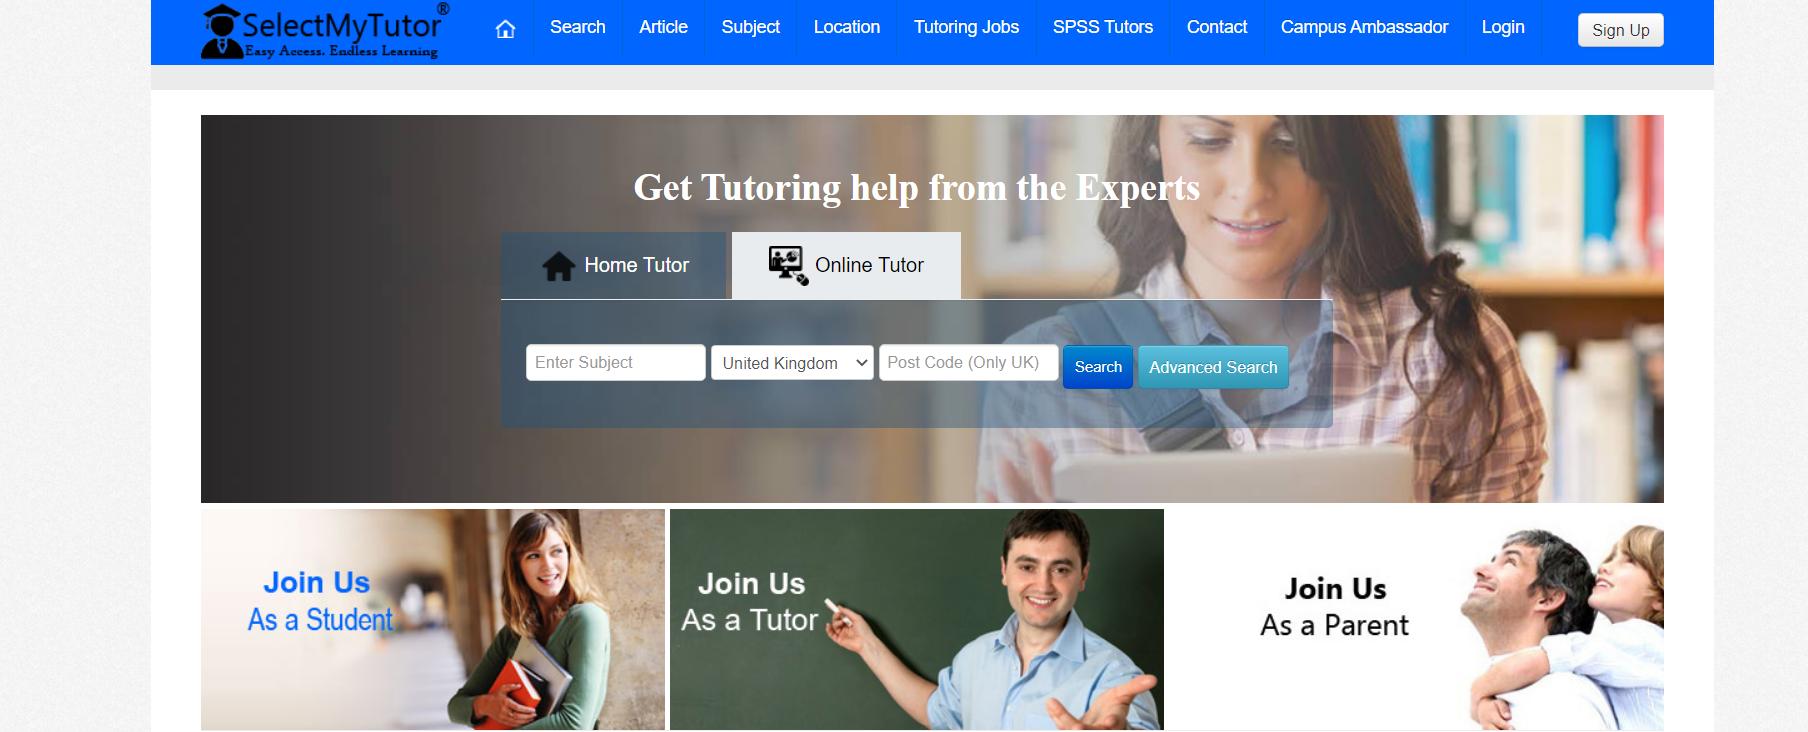 selectmytutor tutoring